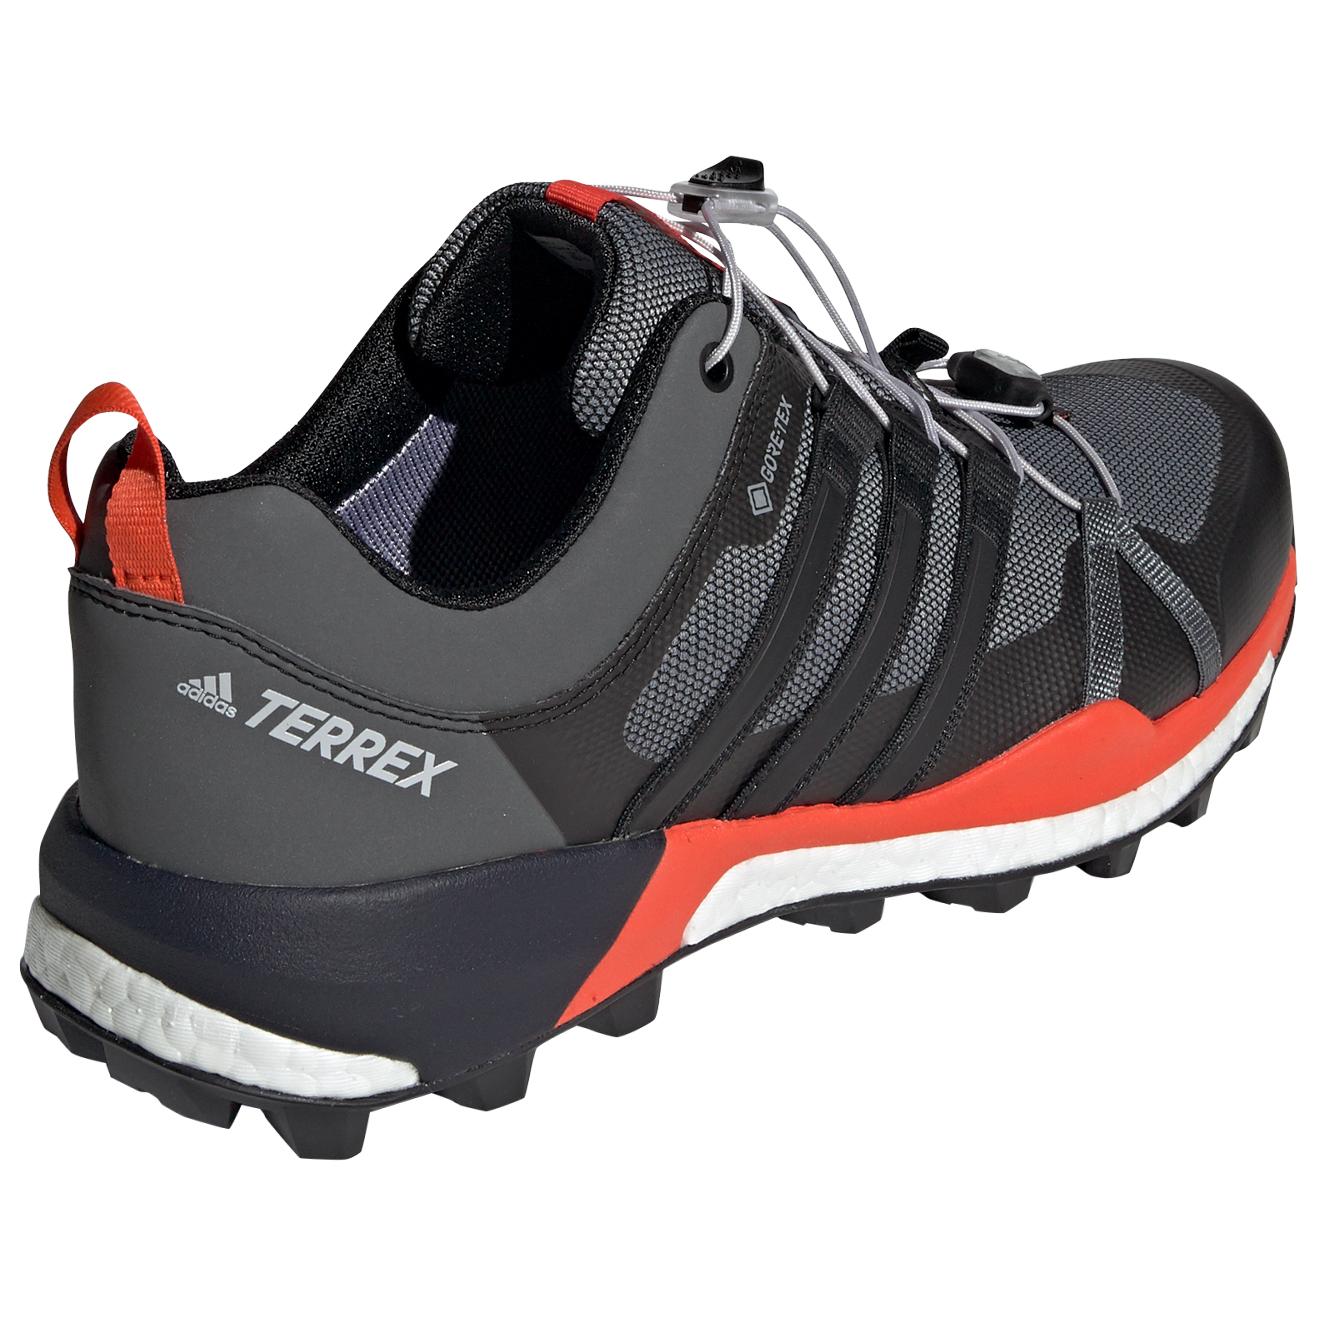 chaussure d approche adidas,Adidas Femmes Shopping 2016